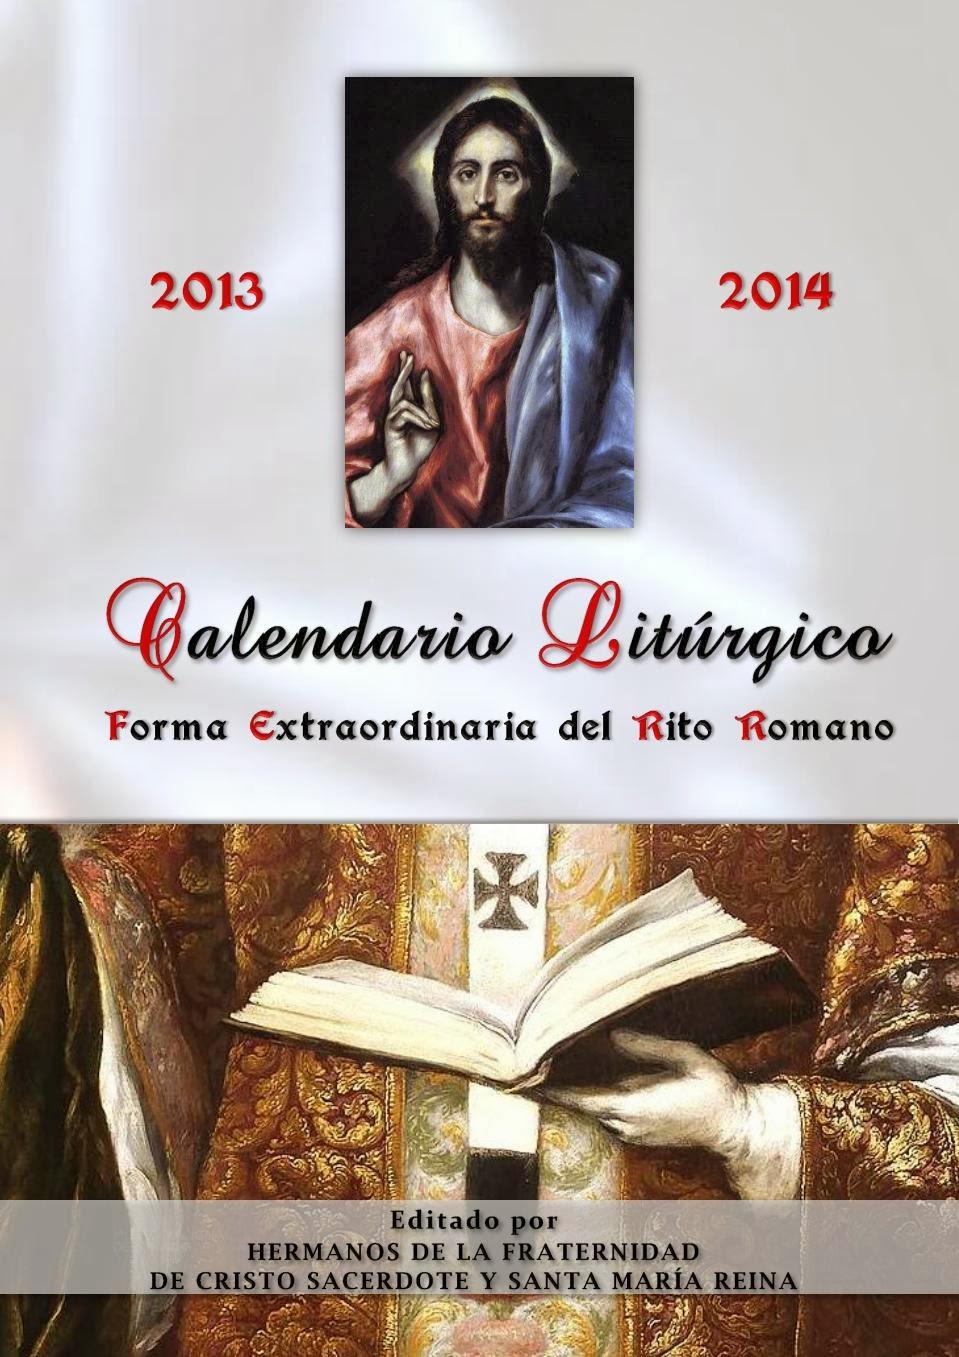 Liturgico 2014 Ano 2013 Calendario